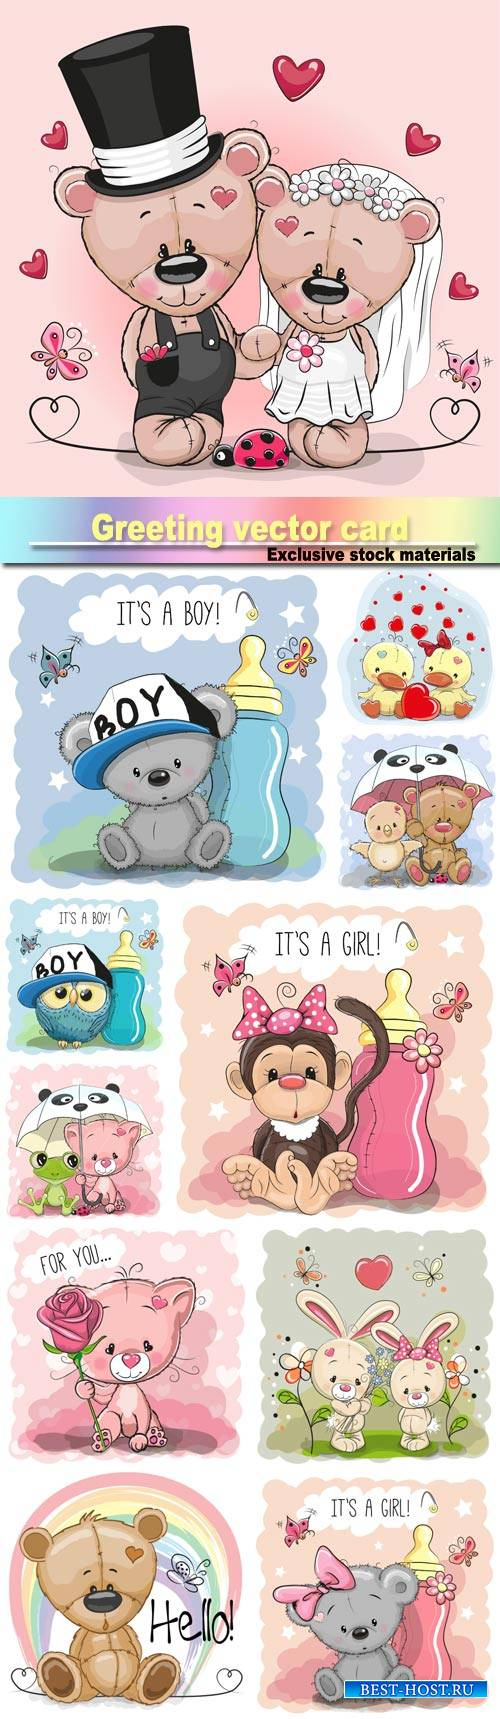 Greeting card cute, cartoon bear girl, monkey, teddy bride and teddy groom, ...